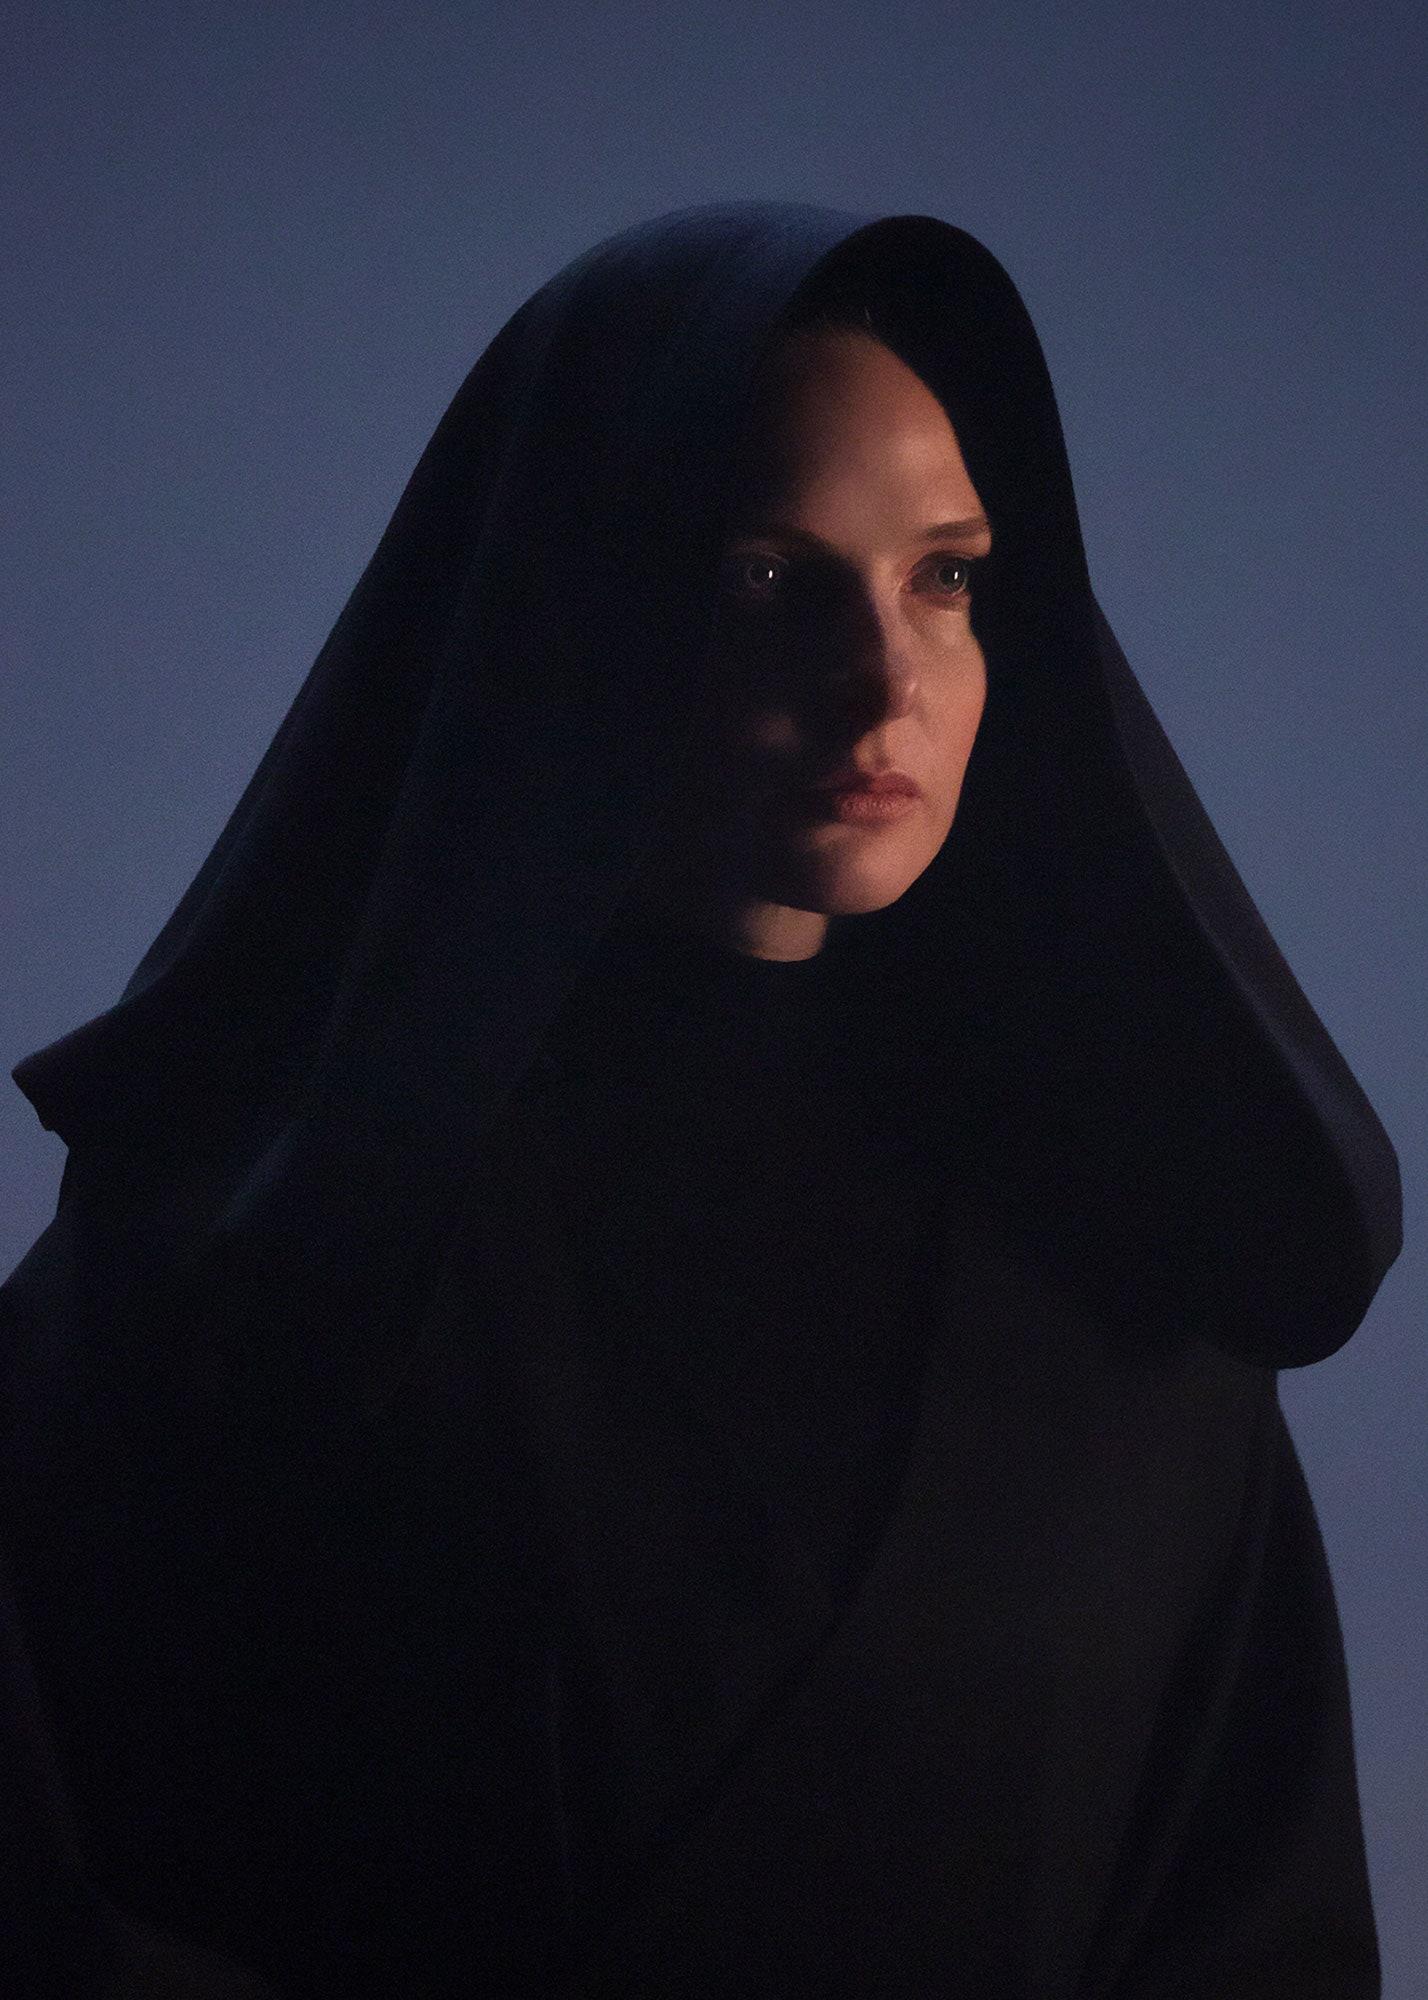 Dune 2020 - Rebecca Ferguson as Lady Jessica